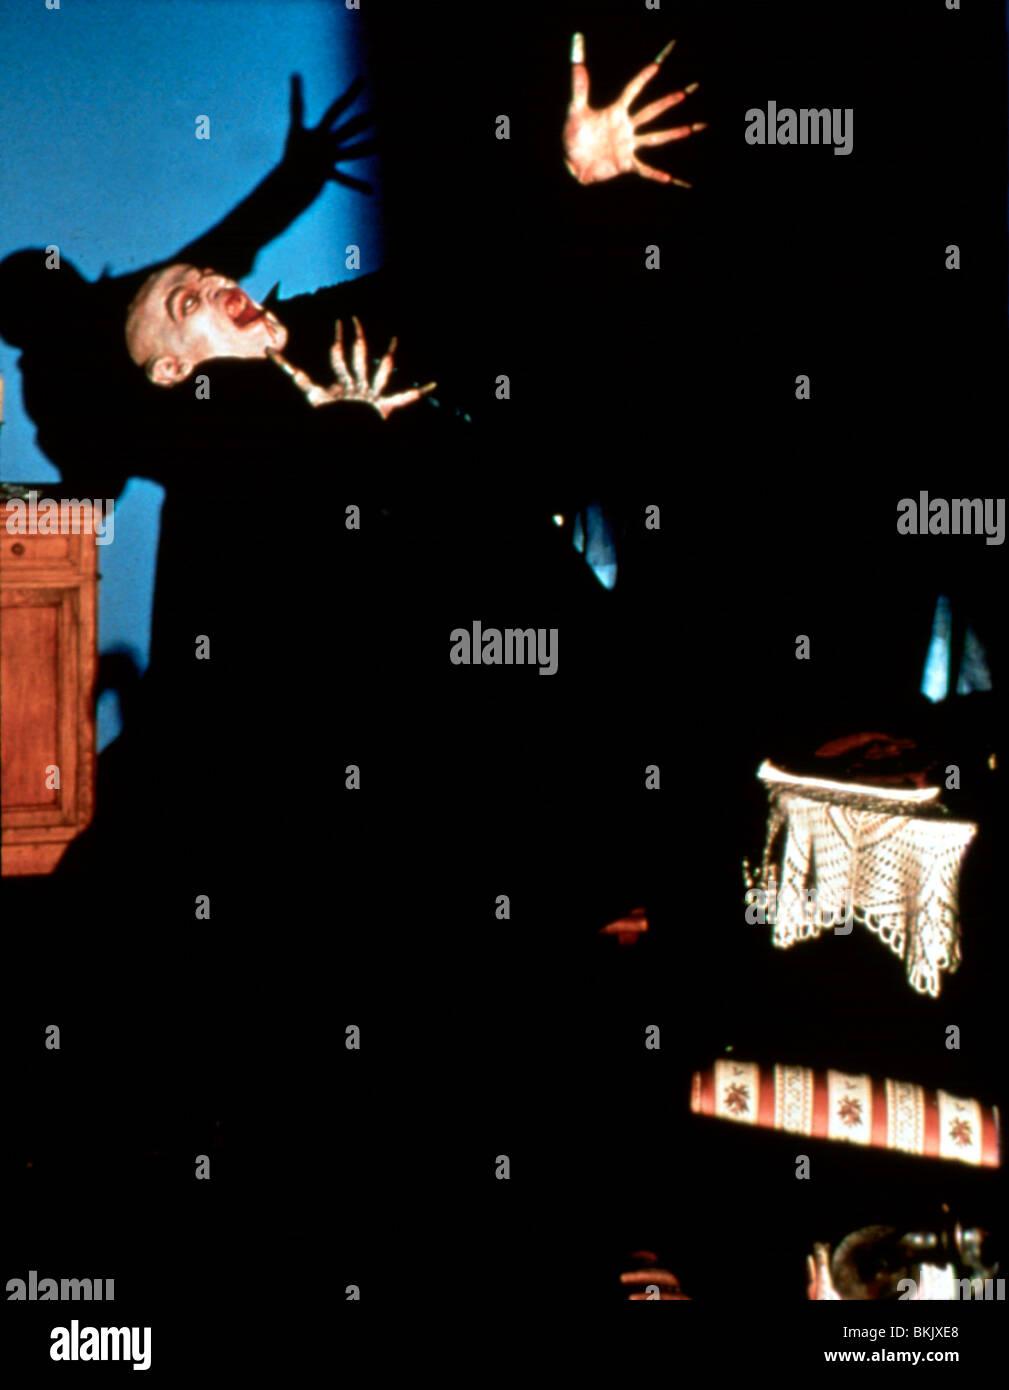 SHADOW OF THE VAMPIRE (2000) Willem Dafoe SHVA 059 Photo Stock